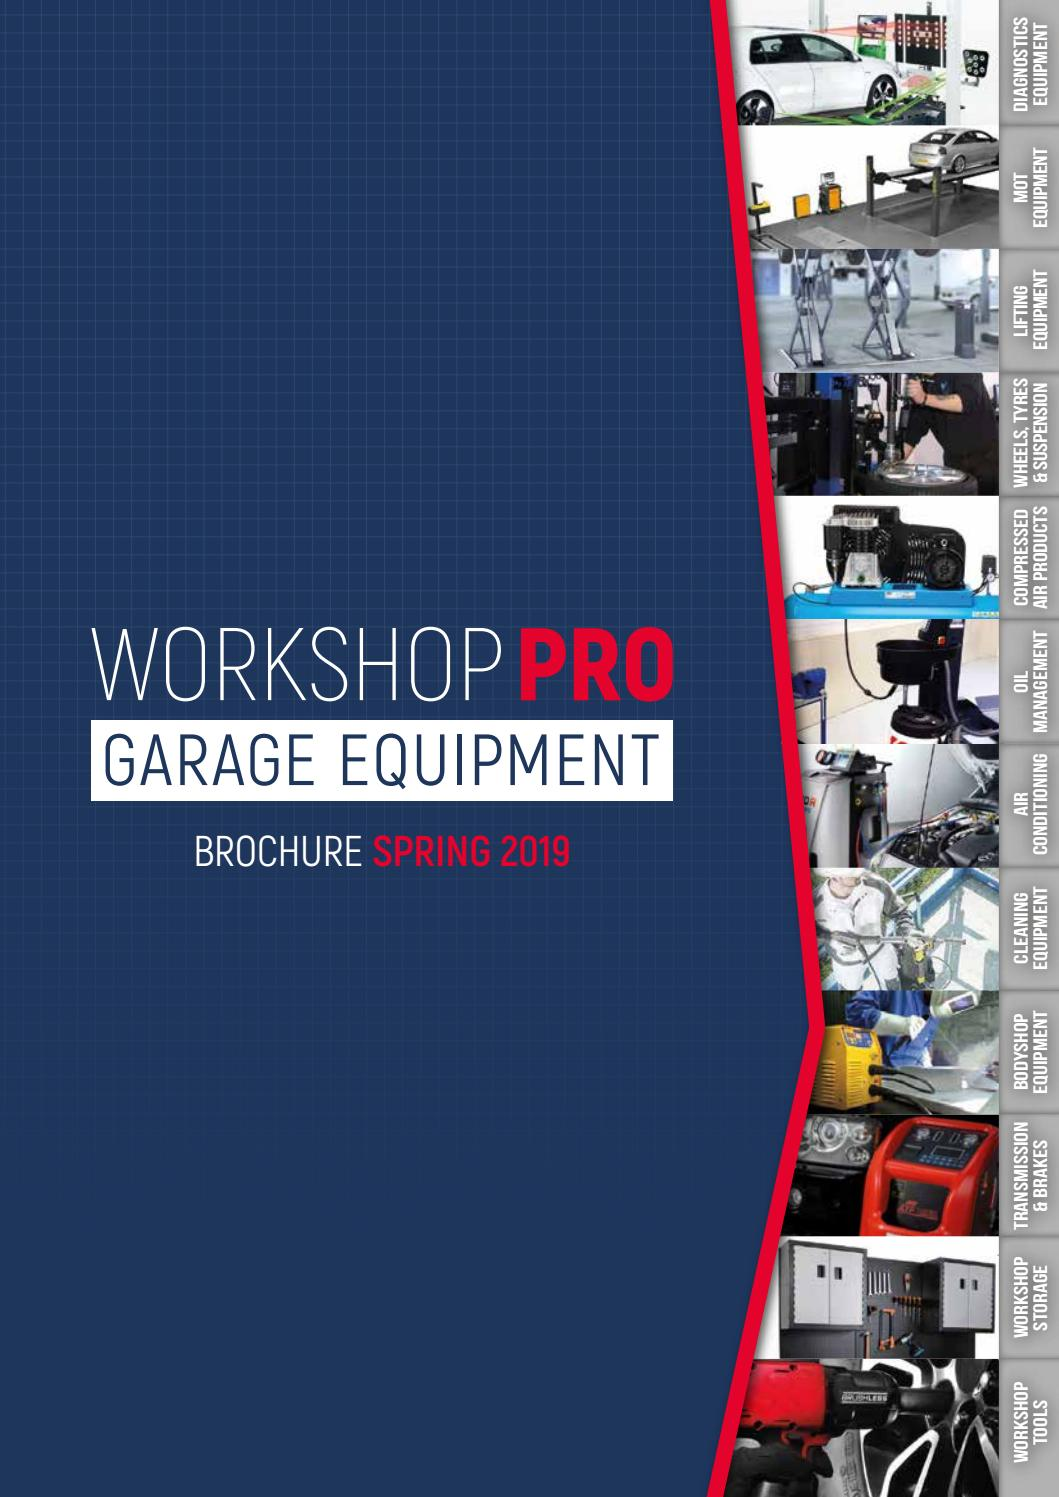 THE NEW WORKSHOP PRO GARAGE EQUIPMENT SPRING 2019 BROCHURE